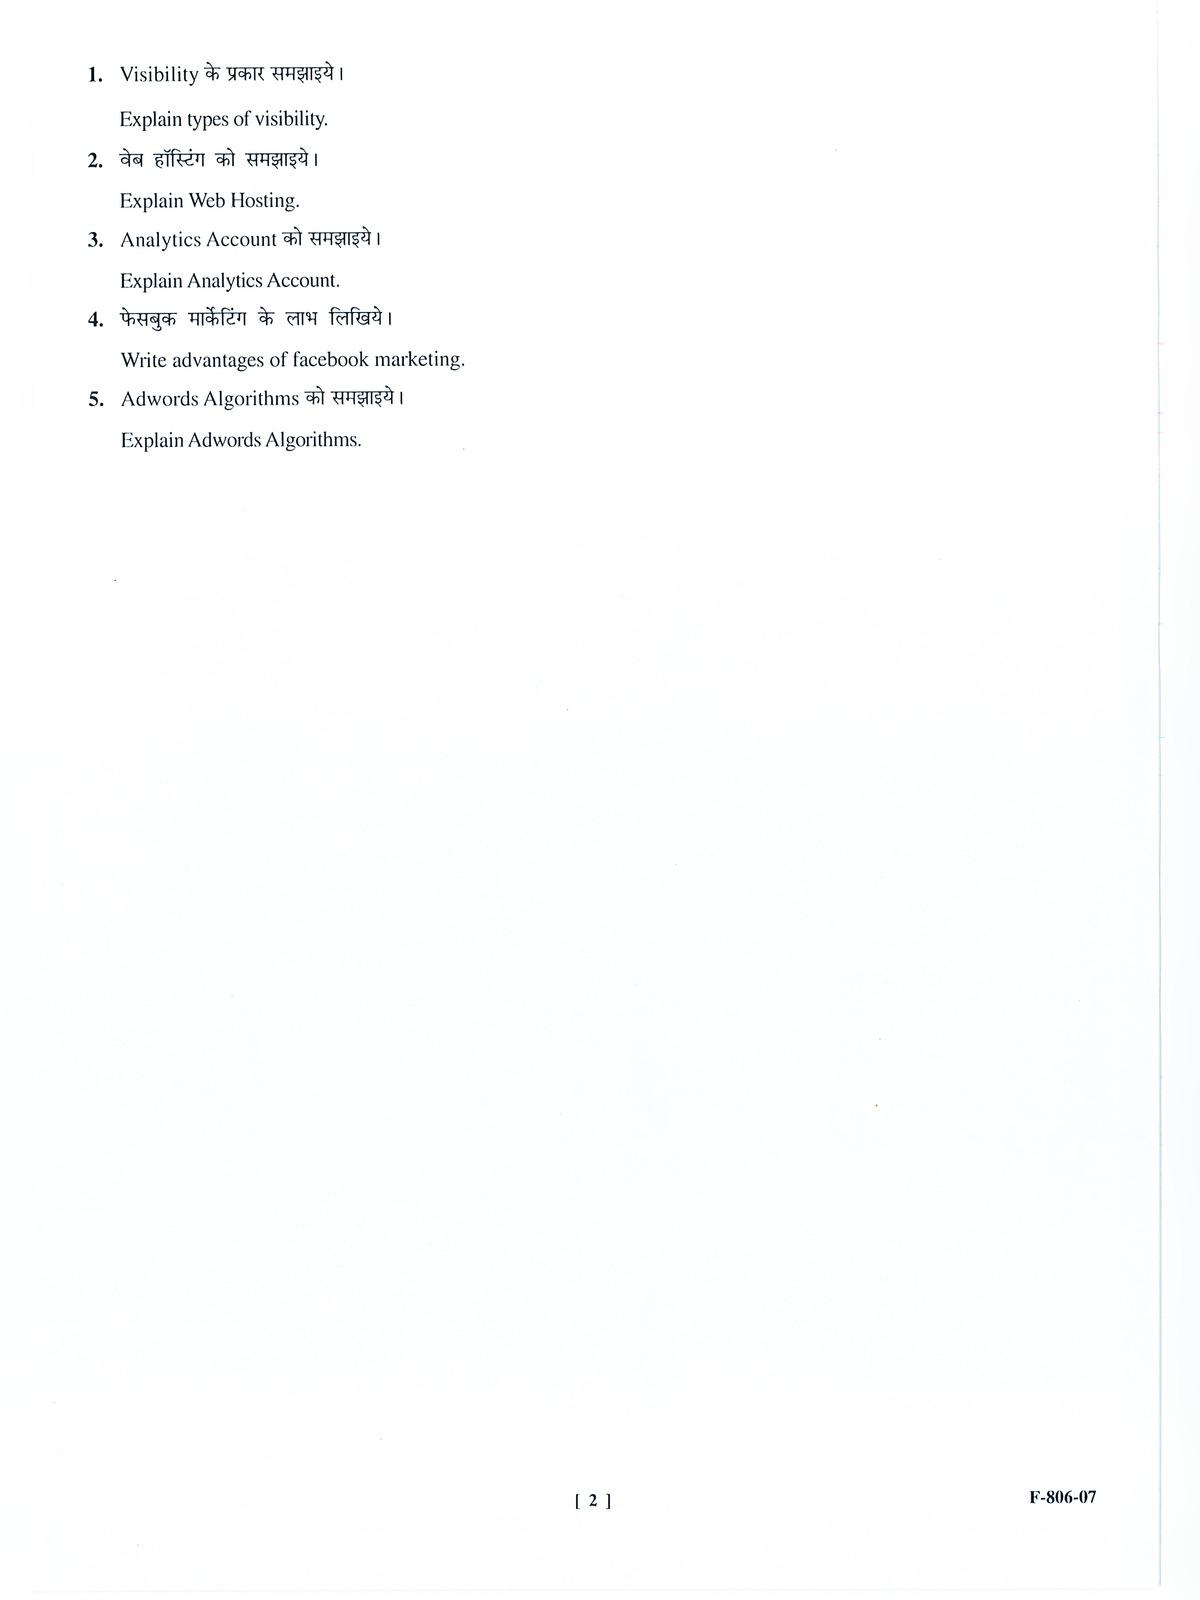 RDVV Question Paper 2021 pdf